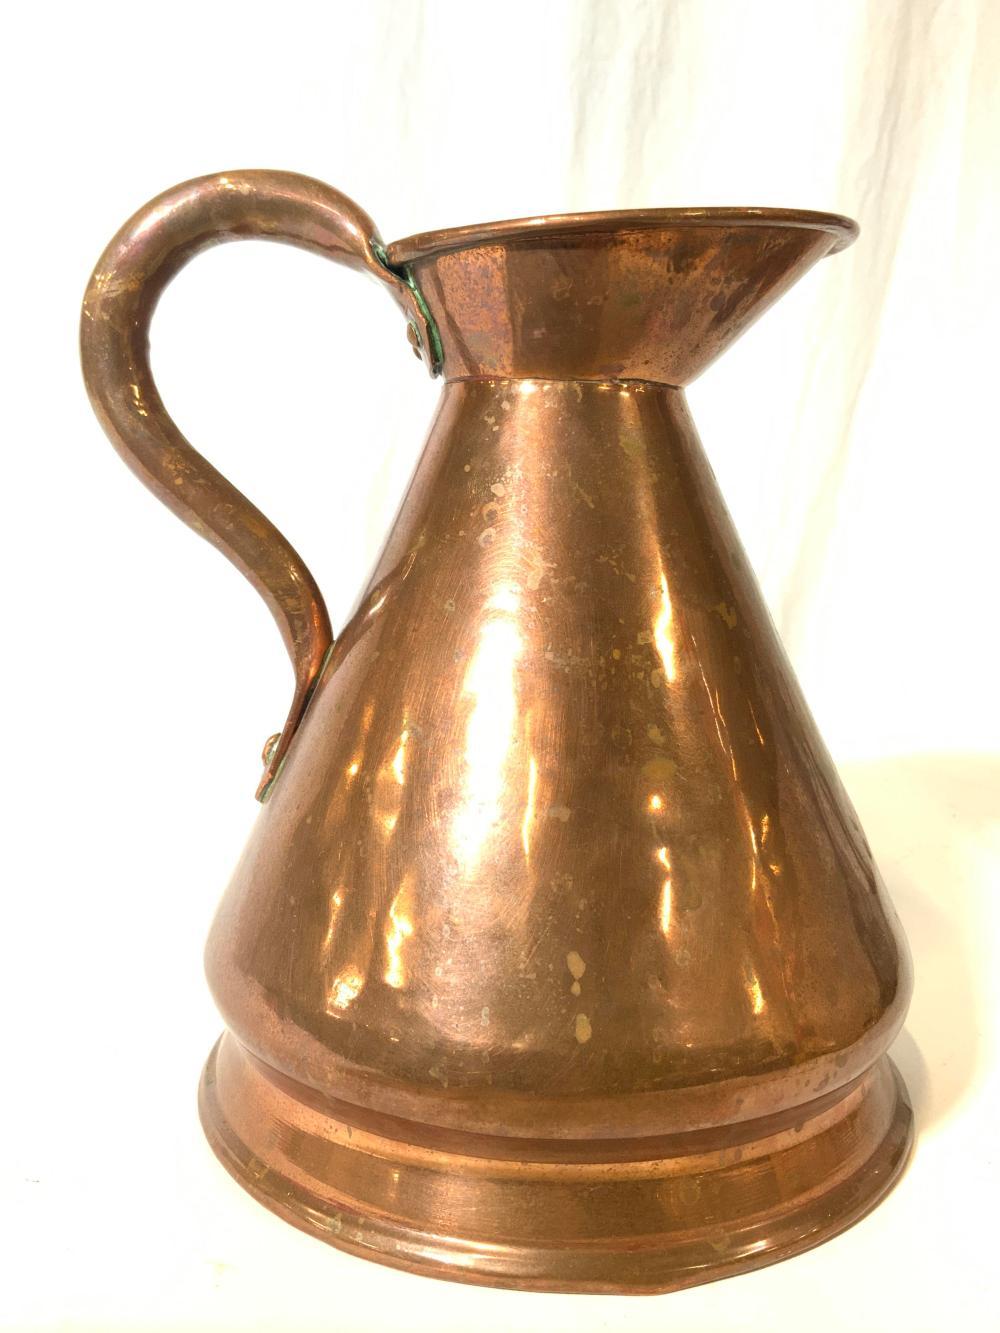 Antique Copper Pitcher Ewer Vessel